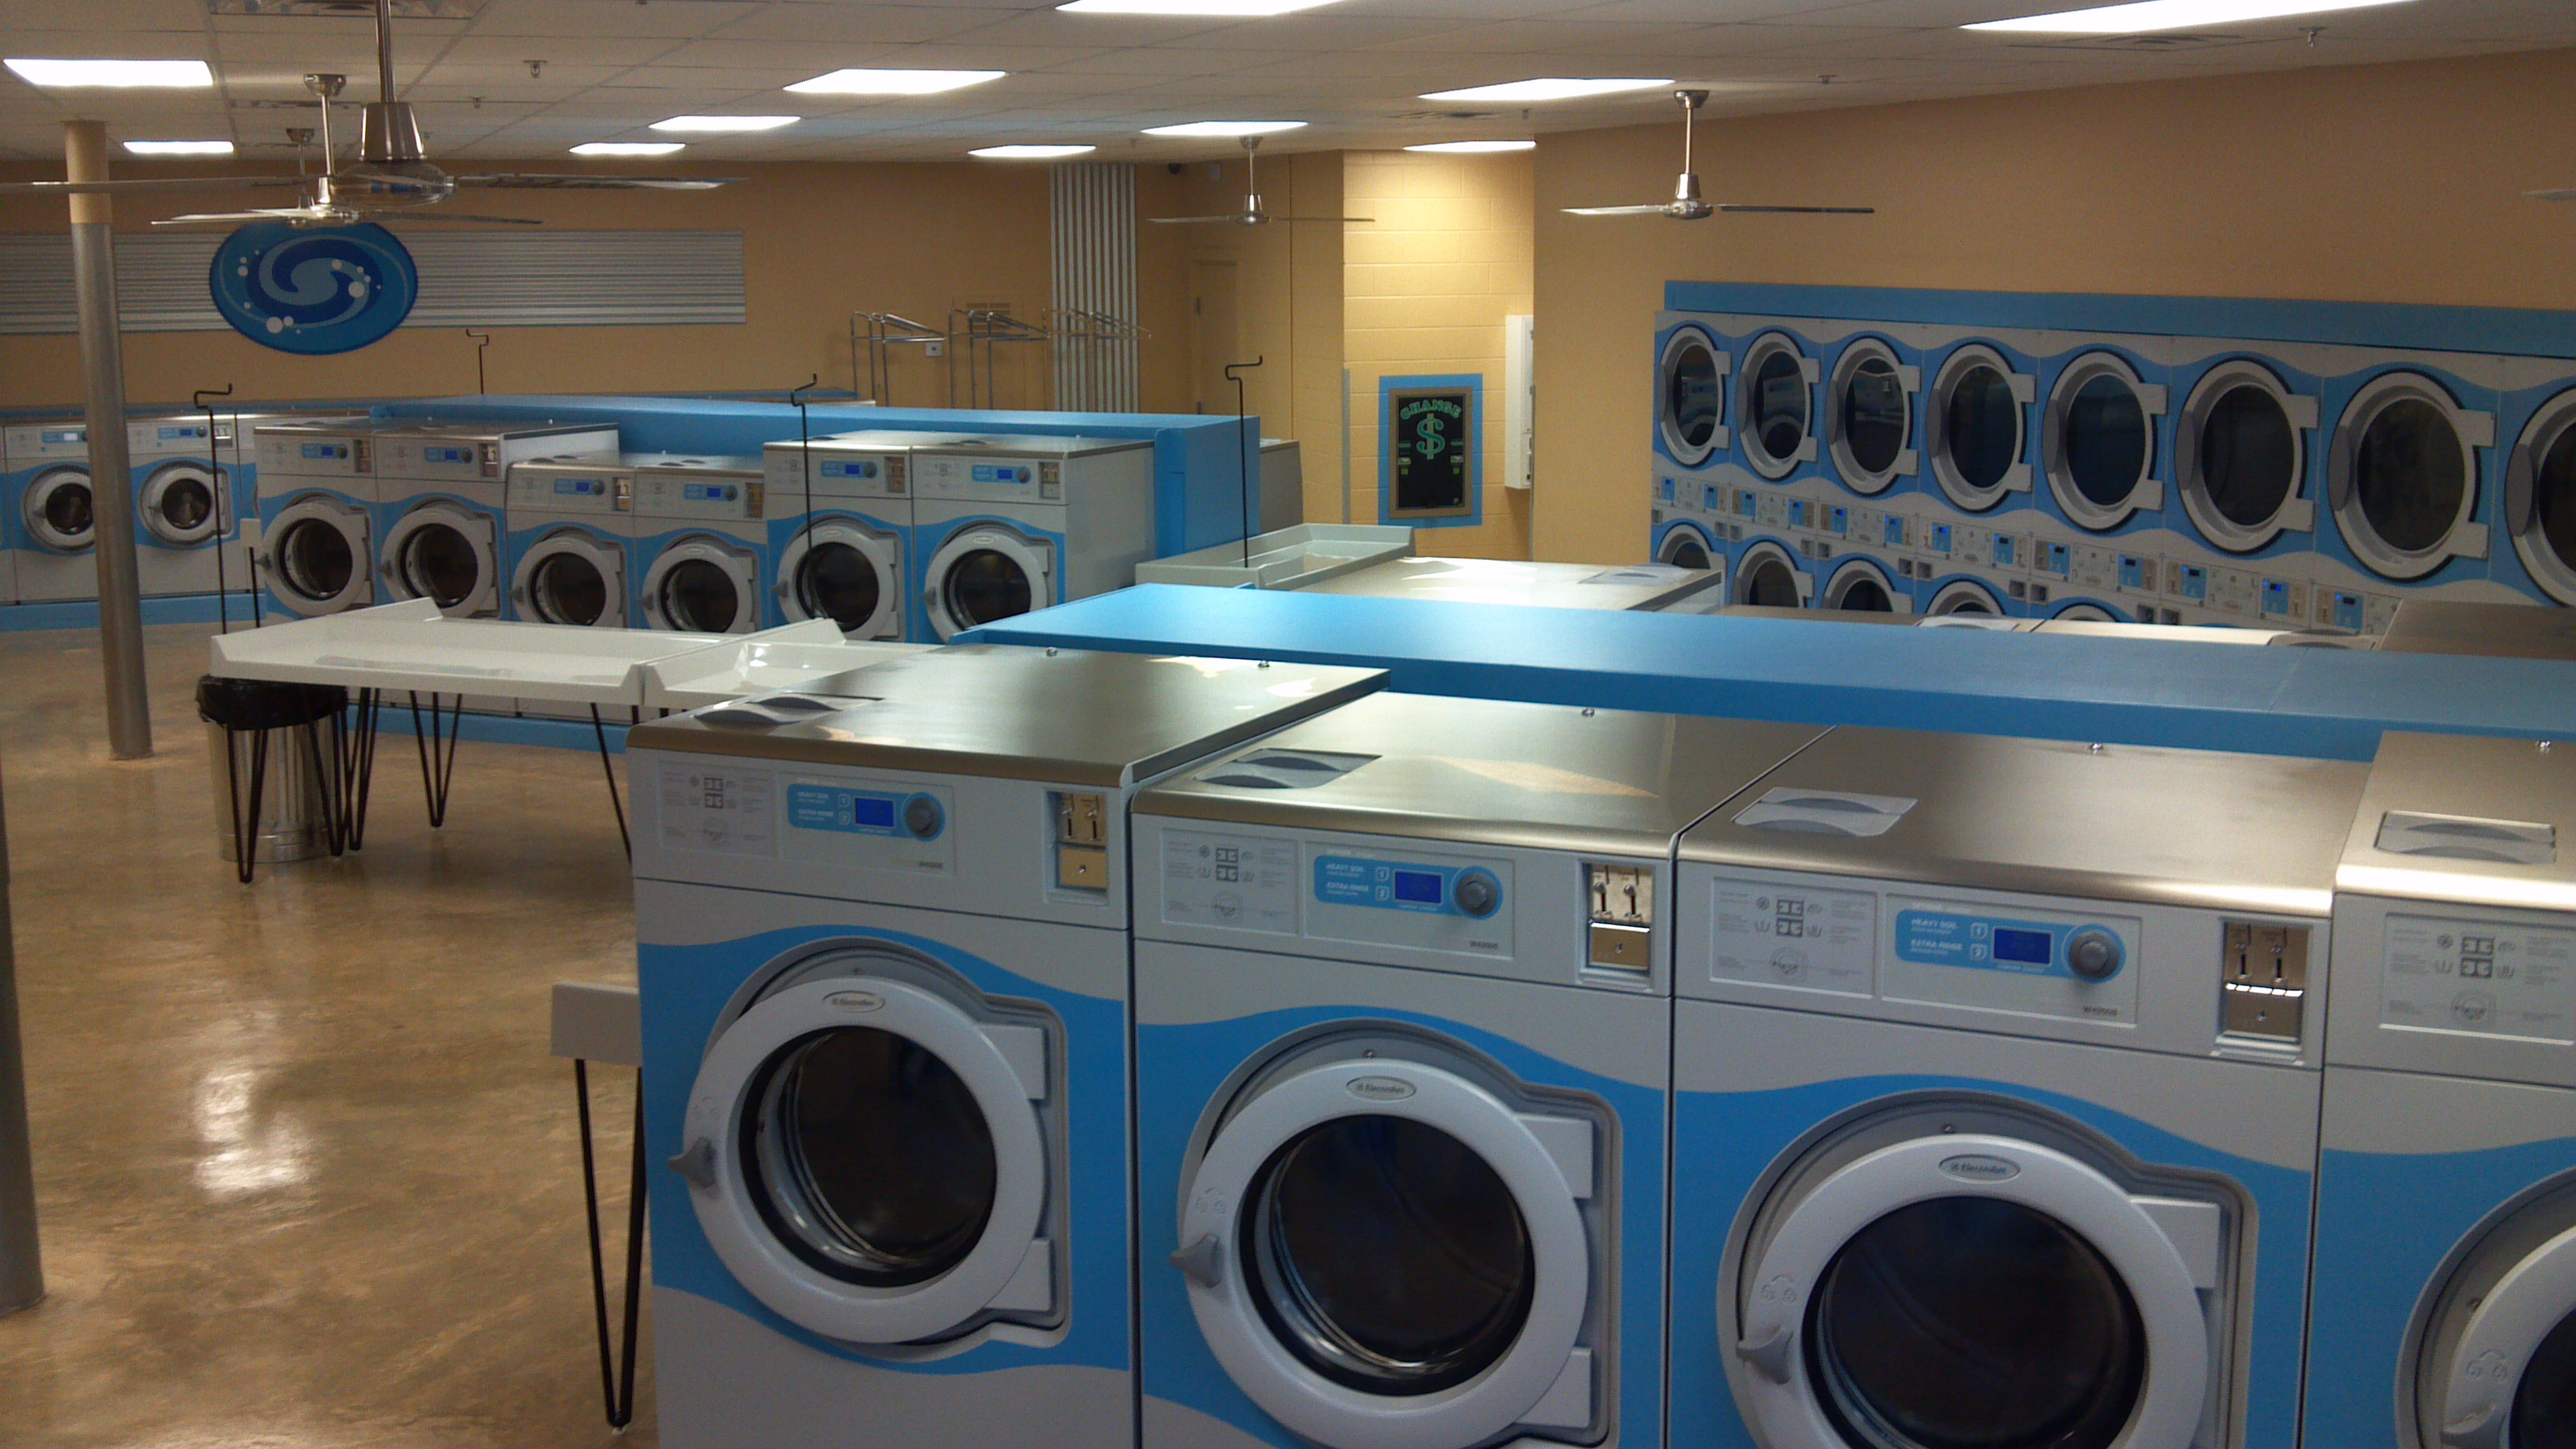 Wavemax Laundry 929 Mcduff Ave S Jacksonville Fl 32205